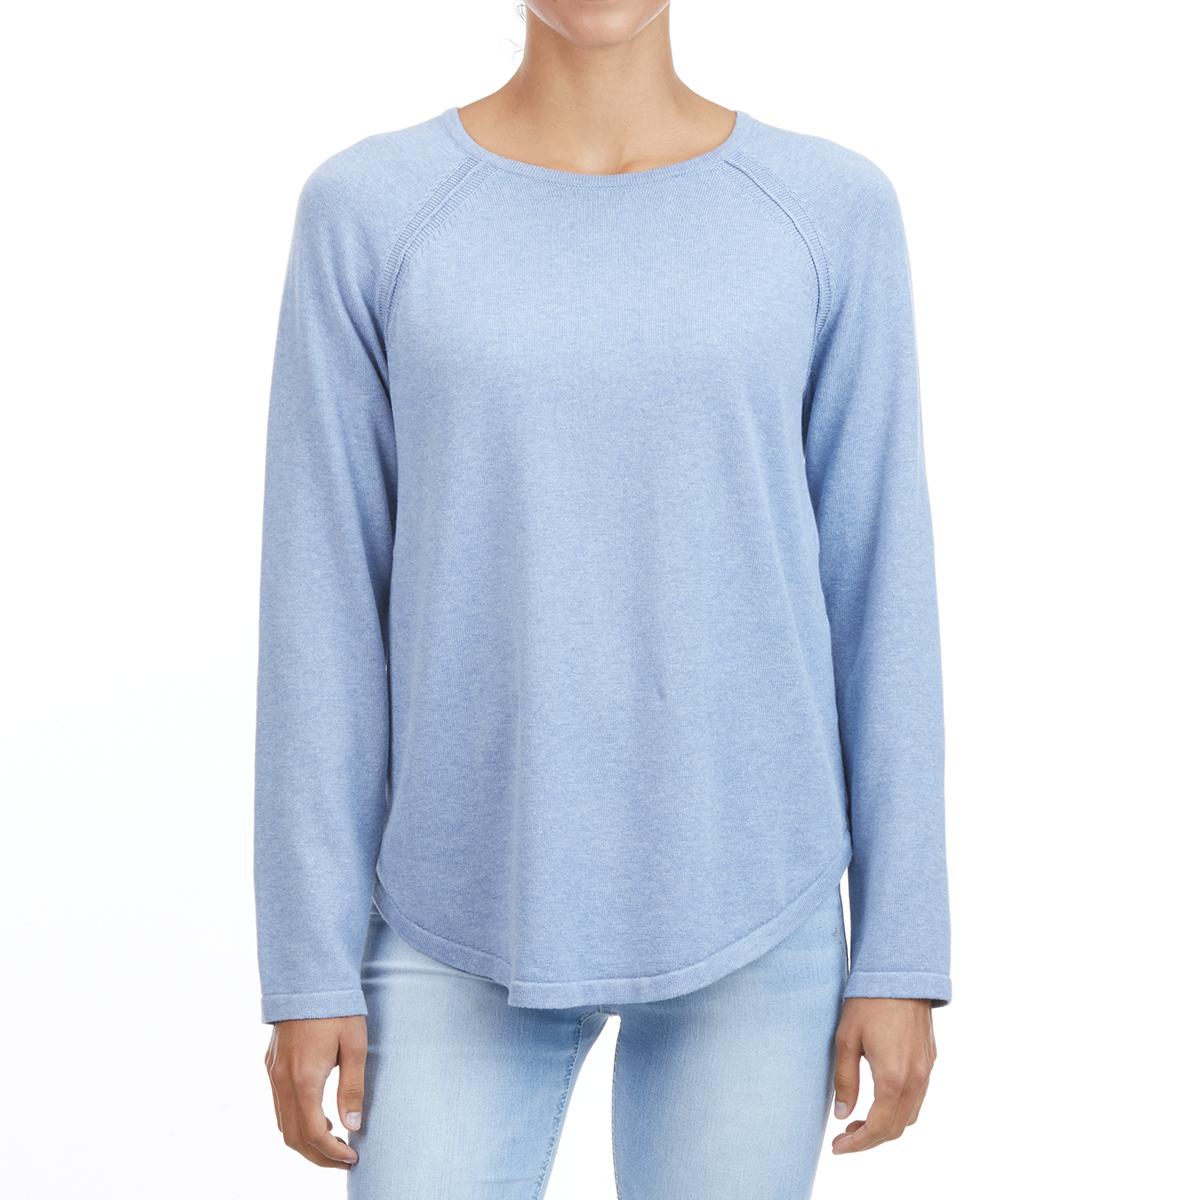 Jeanne Pierre Women's Cotton Crew Shirttail Sweater - Blue, M